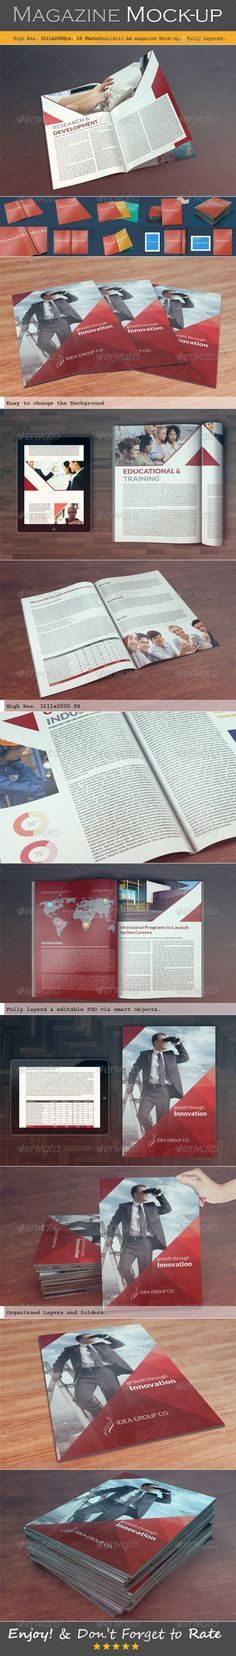 Magazine Mock-up:  http://graphicriver.net/item/magazine-mockup/6385786?WT.ac=portfolio&WT.seg_1=portfolio&WT.z_author=MahmoudRafik?ref=mahmoudrafik